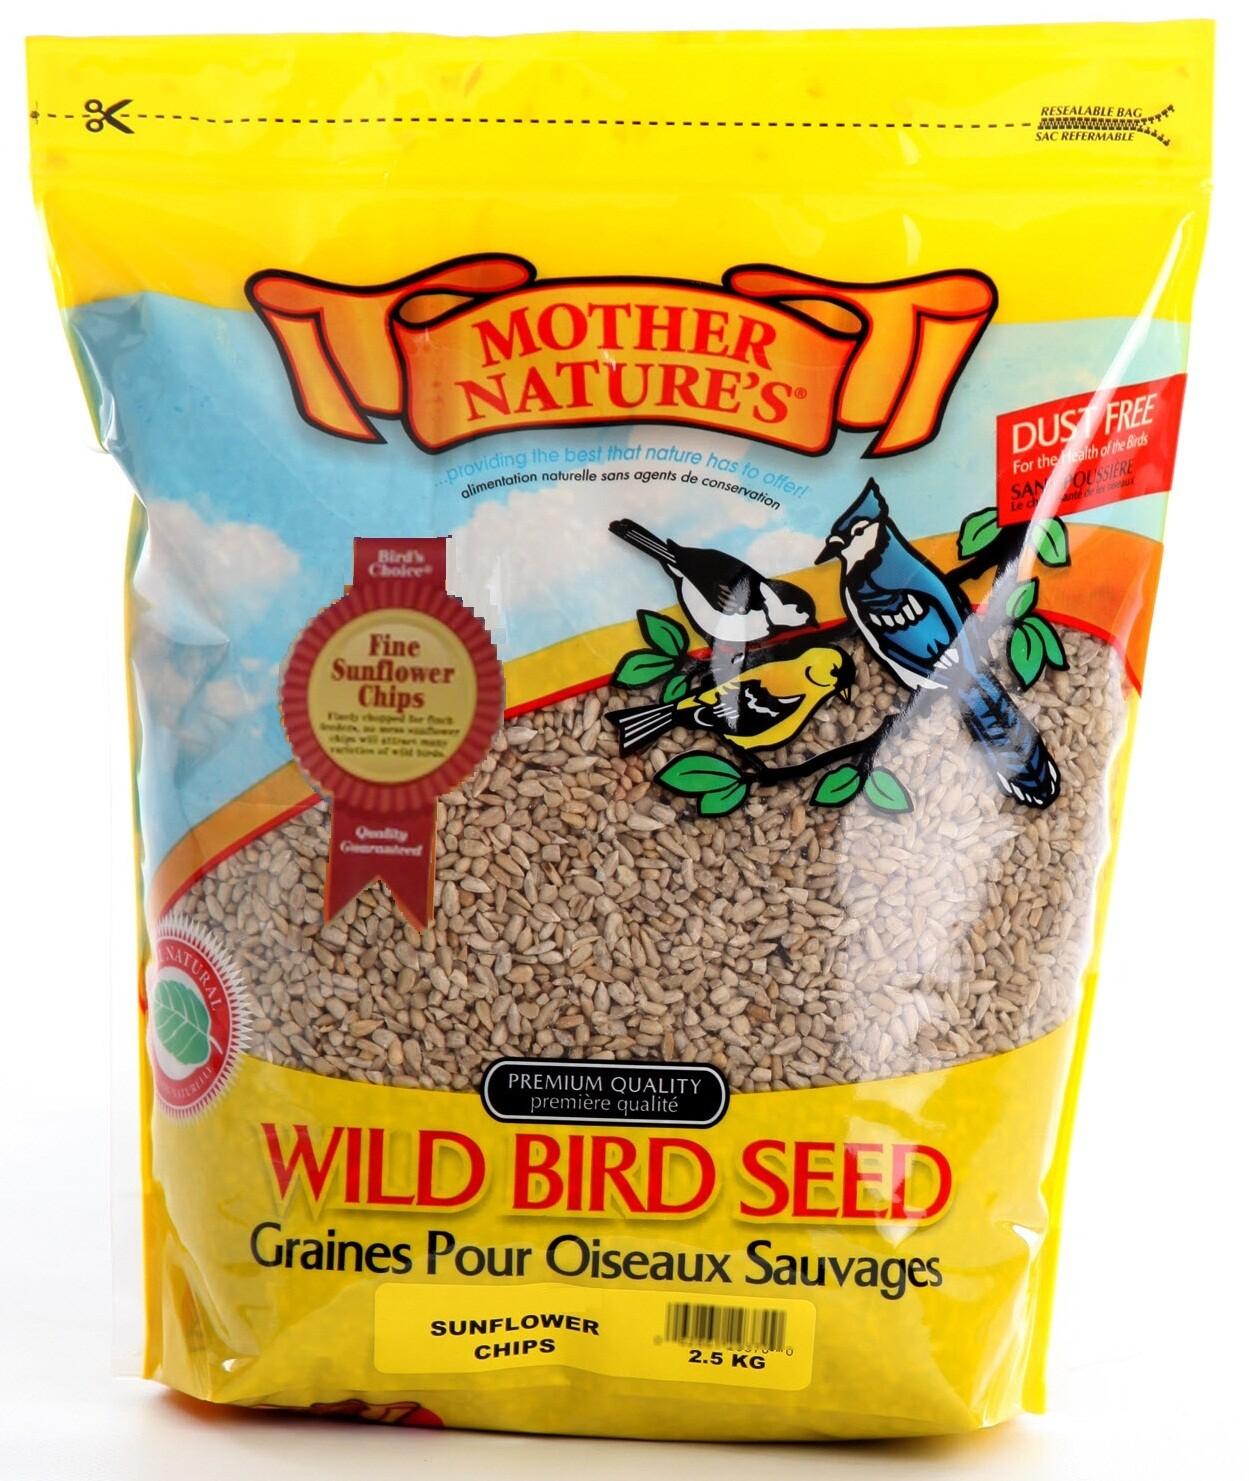 Fine Sunflower Chips-2.5kg